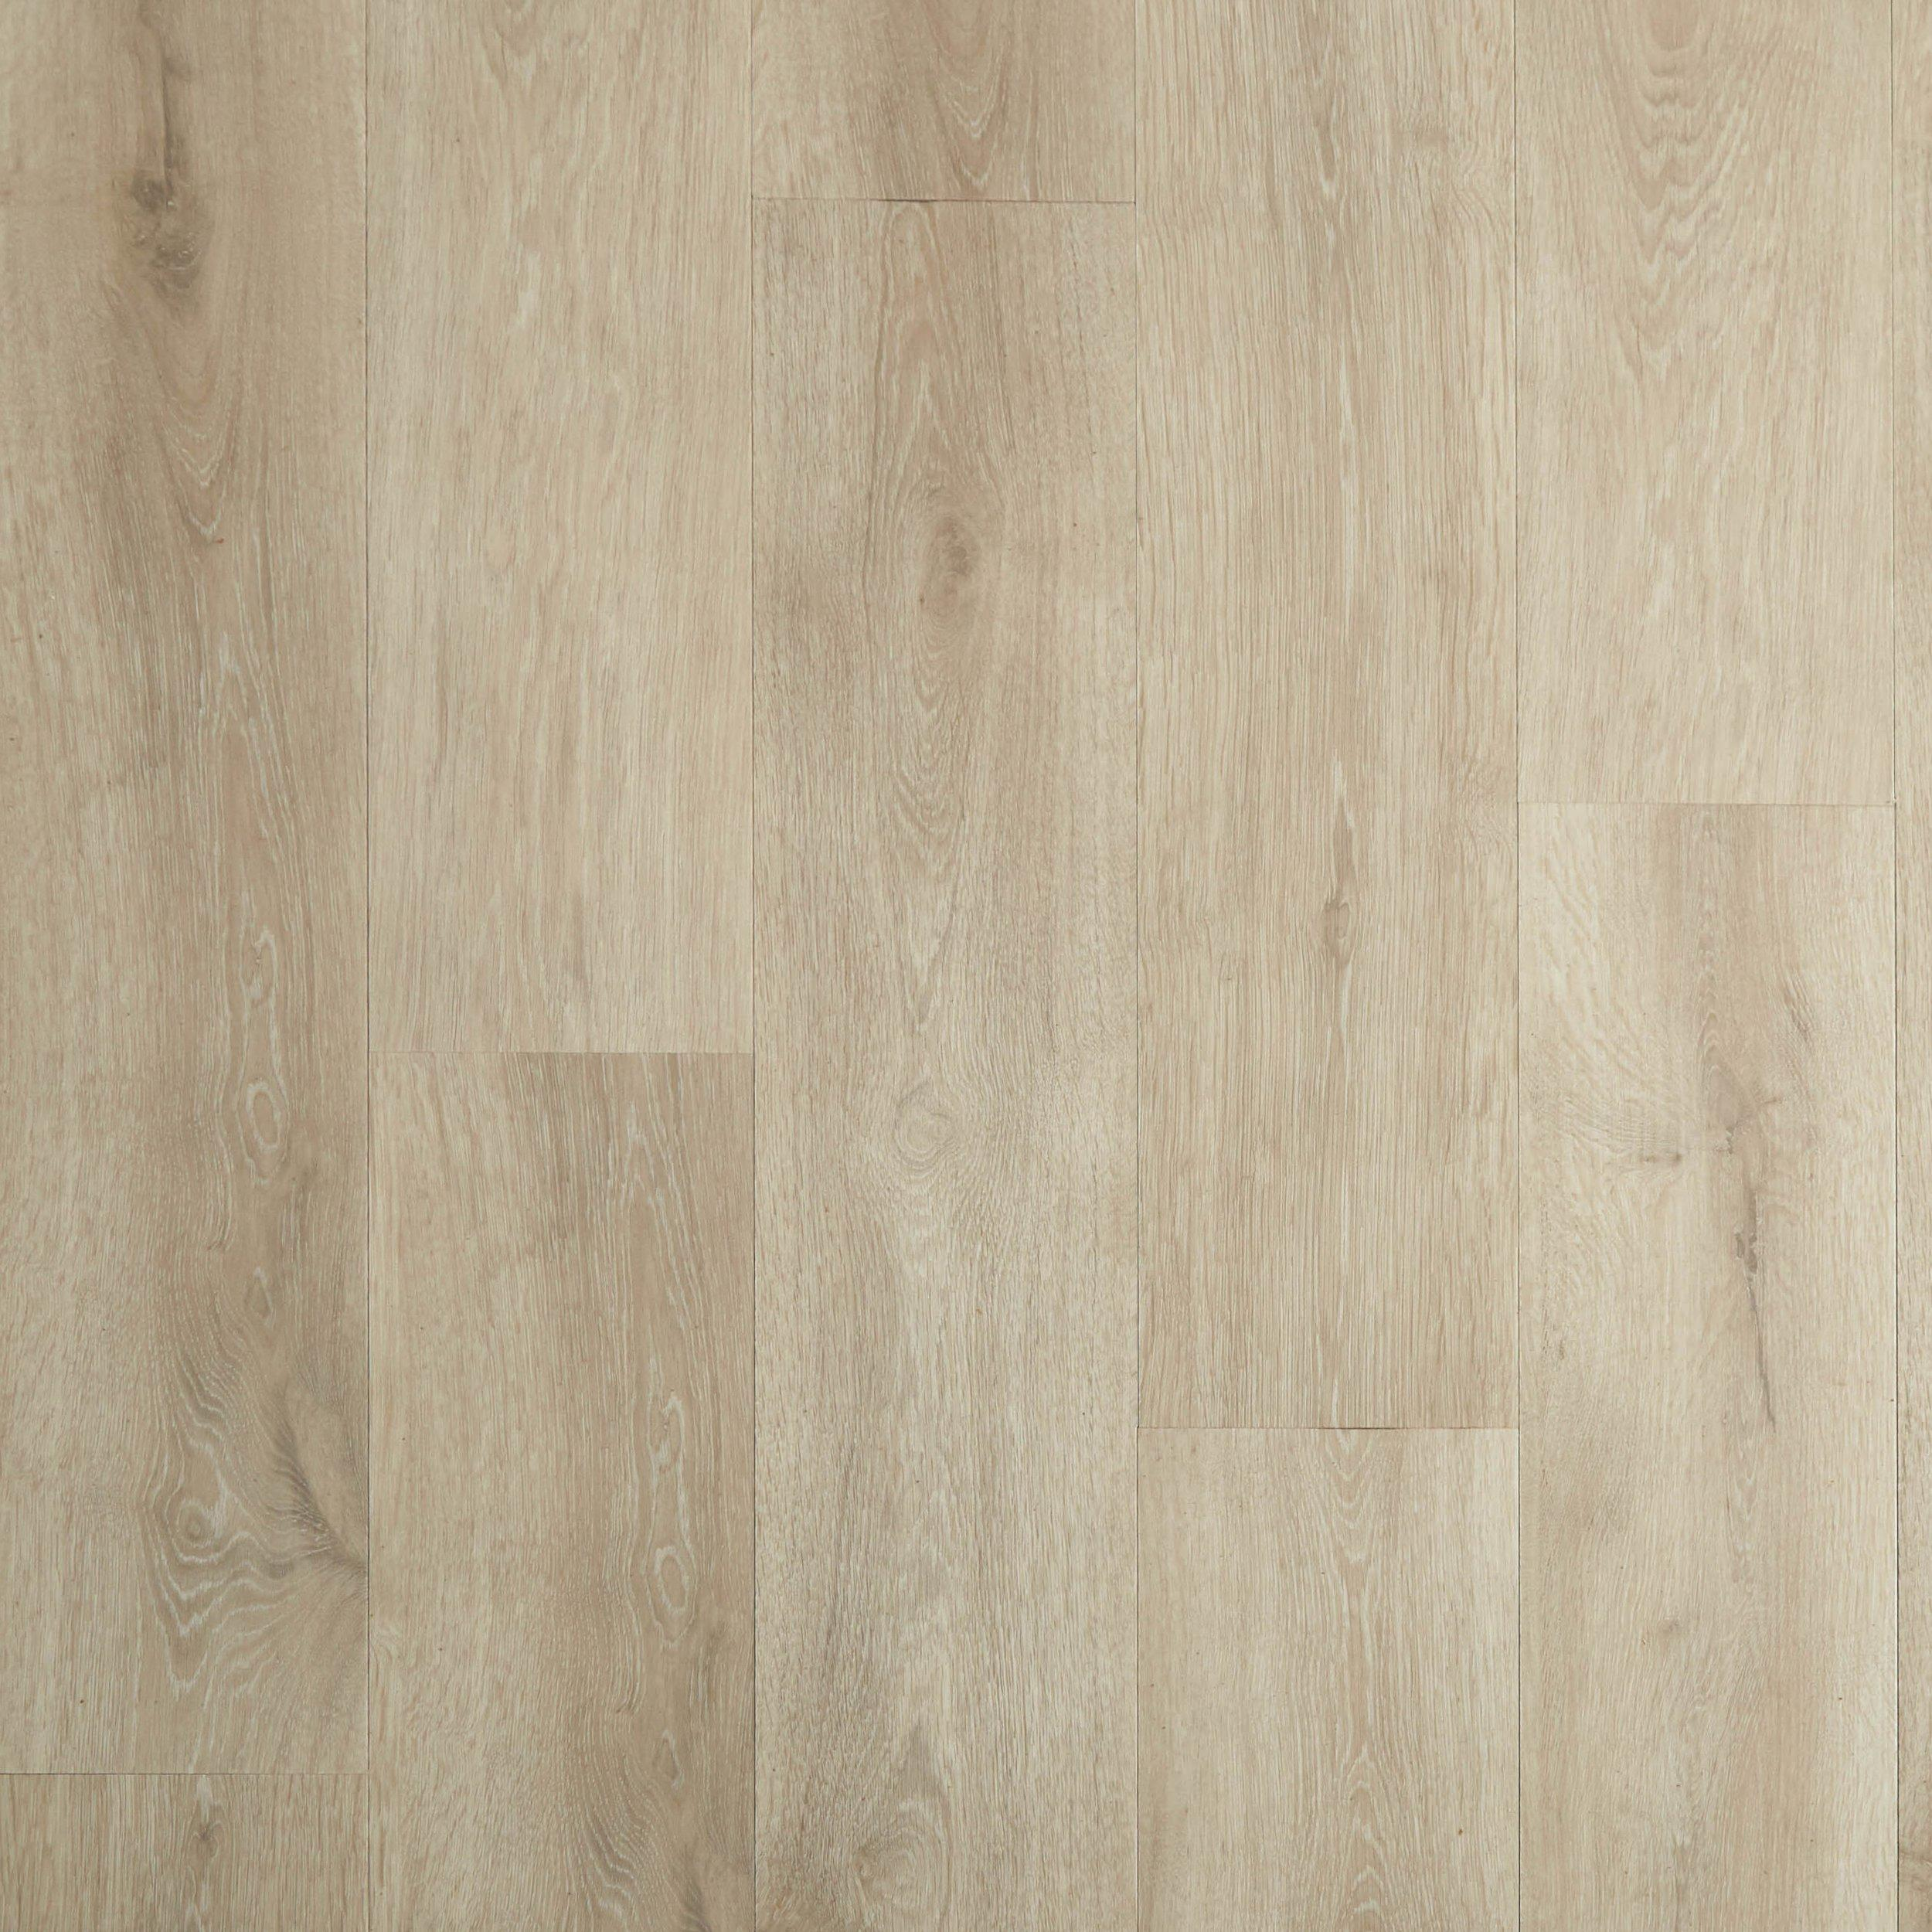 Graycliff Rigid Core Luxury Vinyl Plank Cork Back